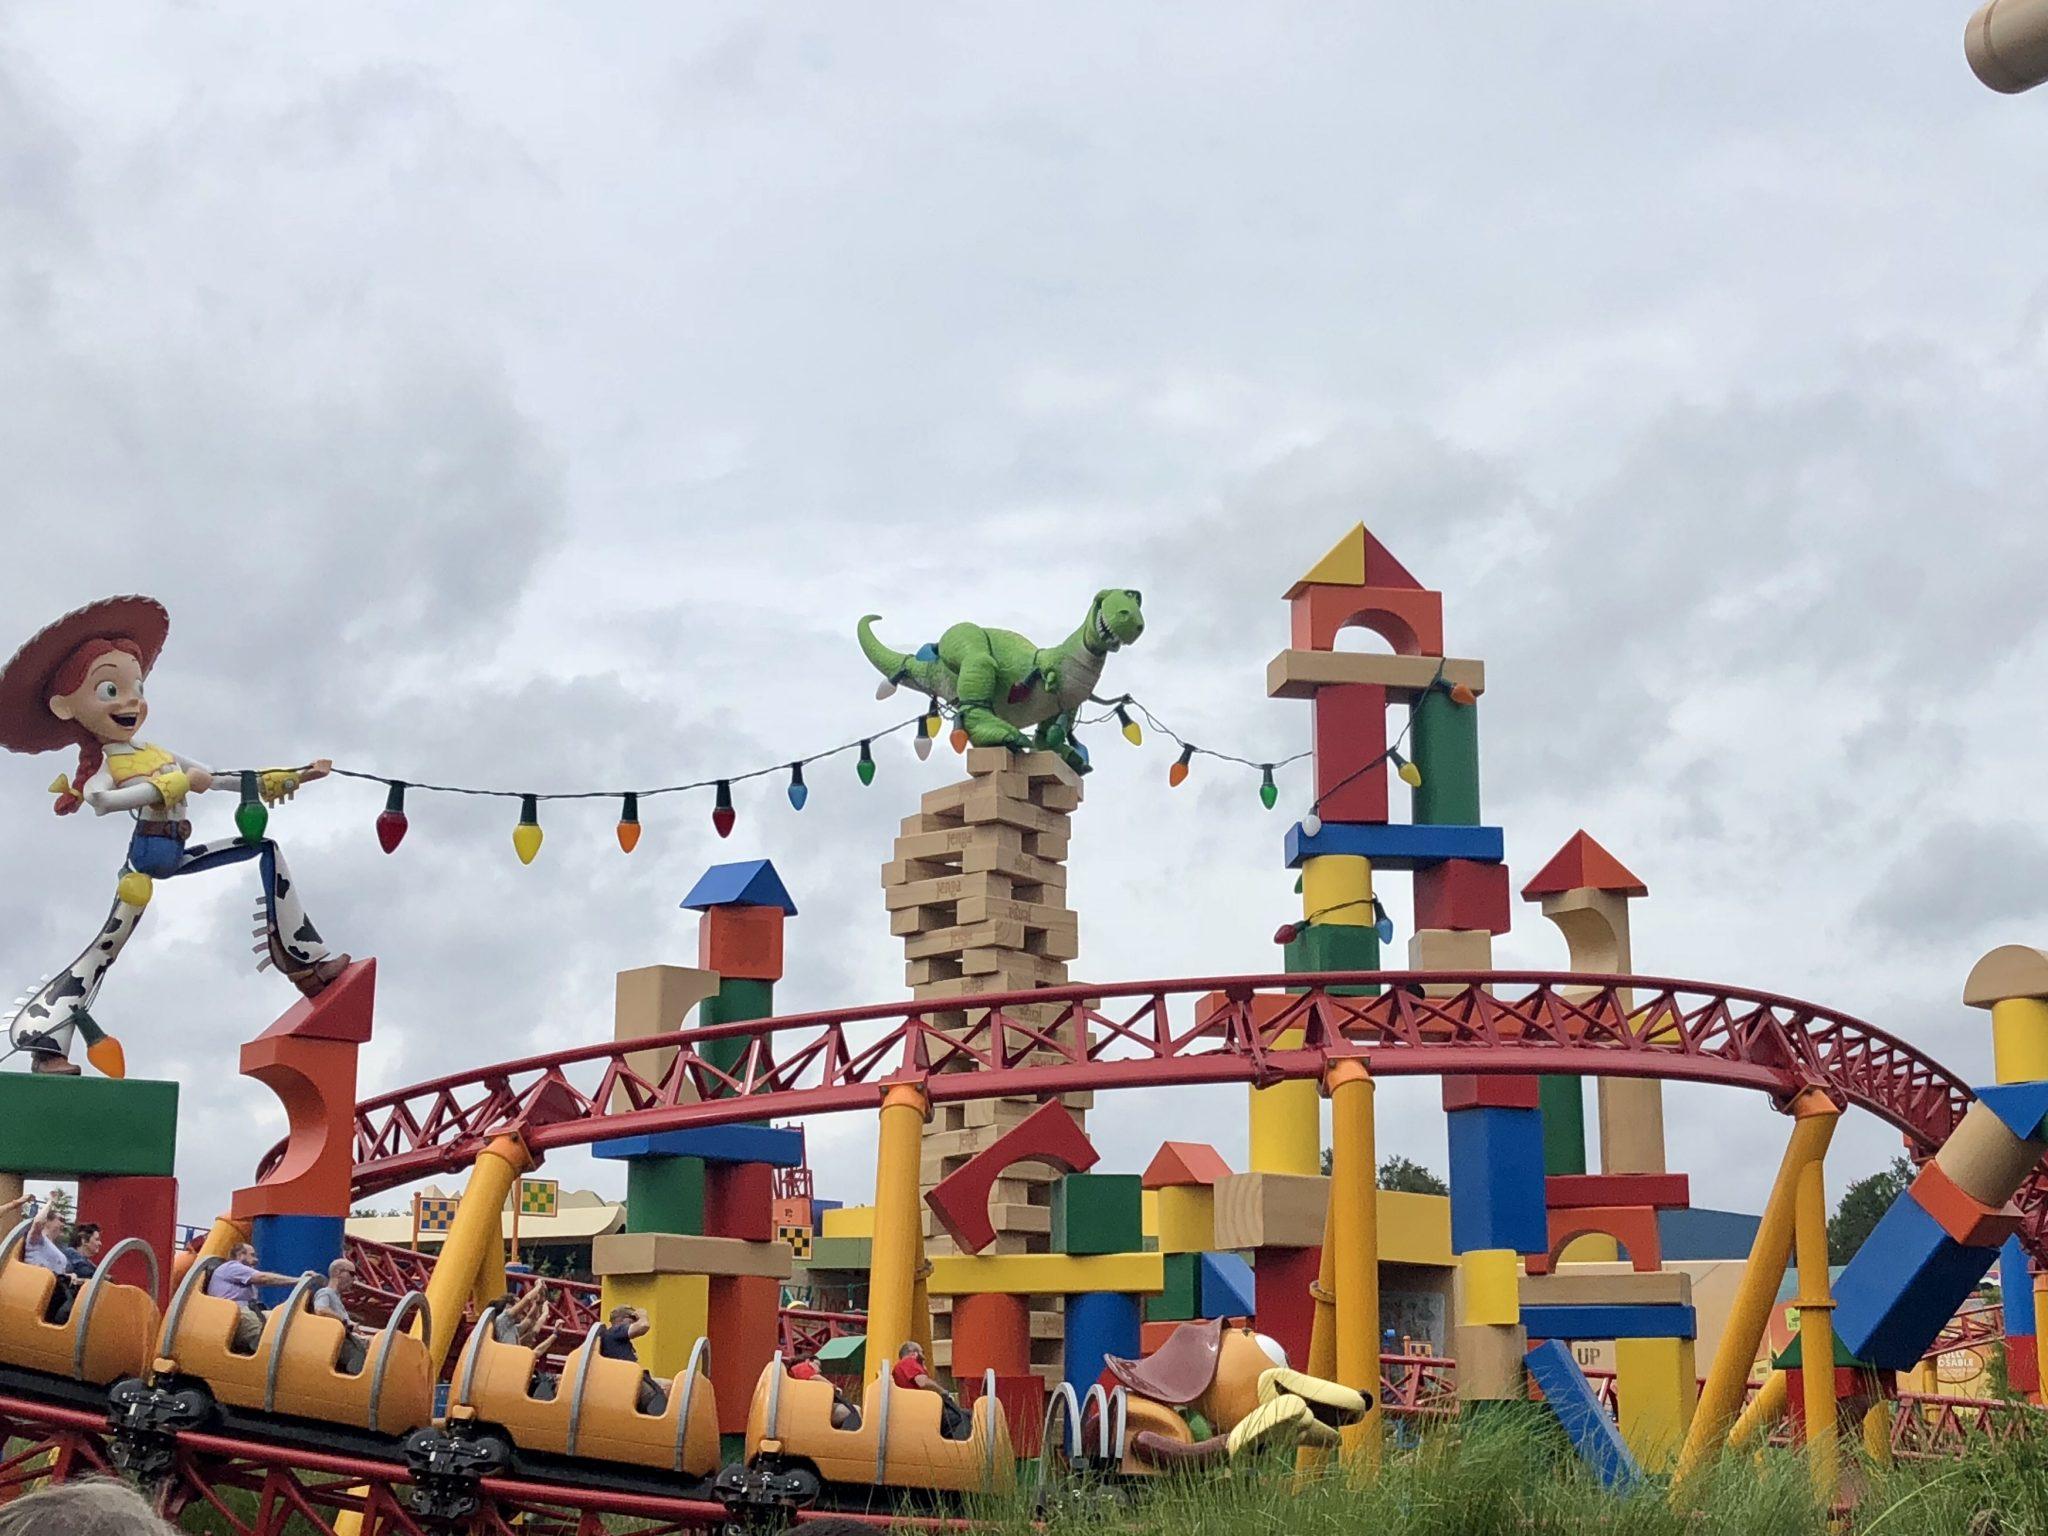 Slinky Dog Dash at Toy Story Land